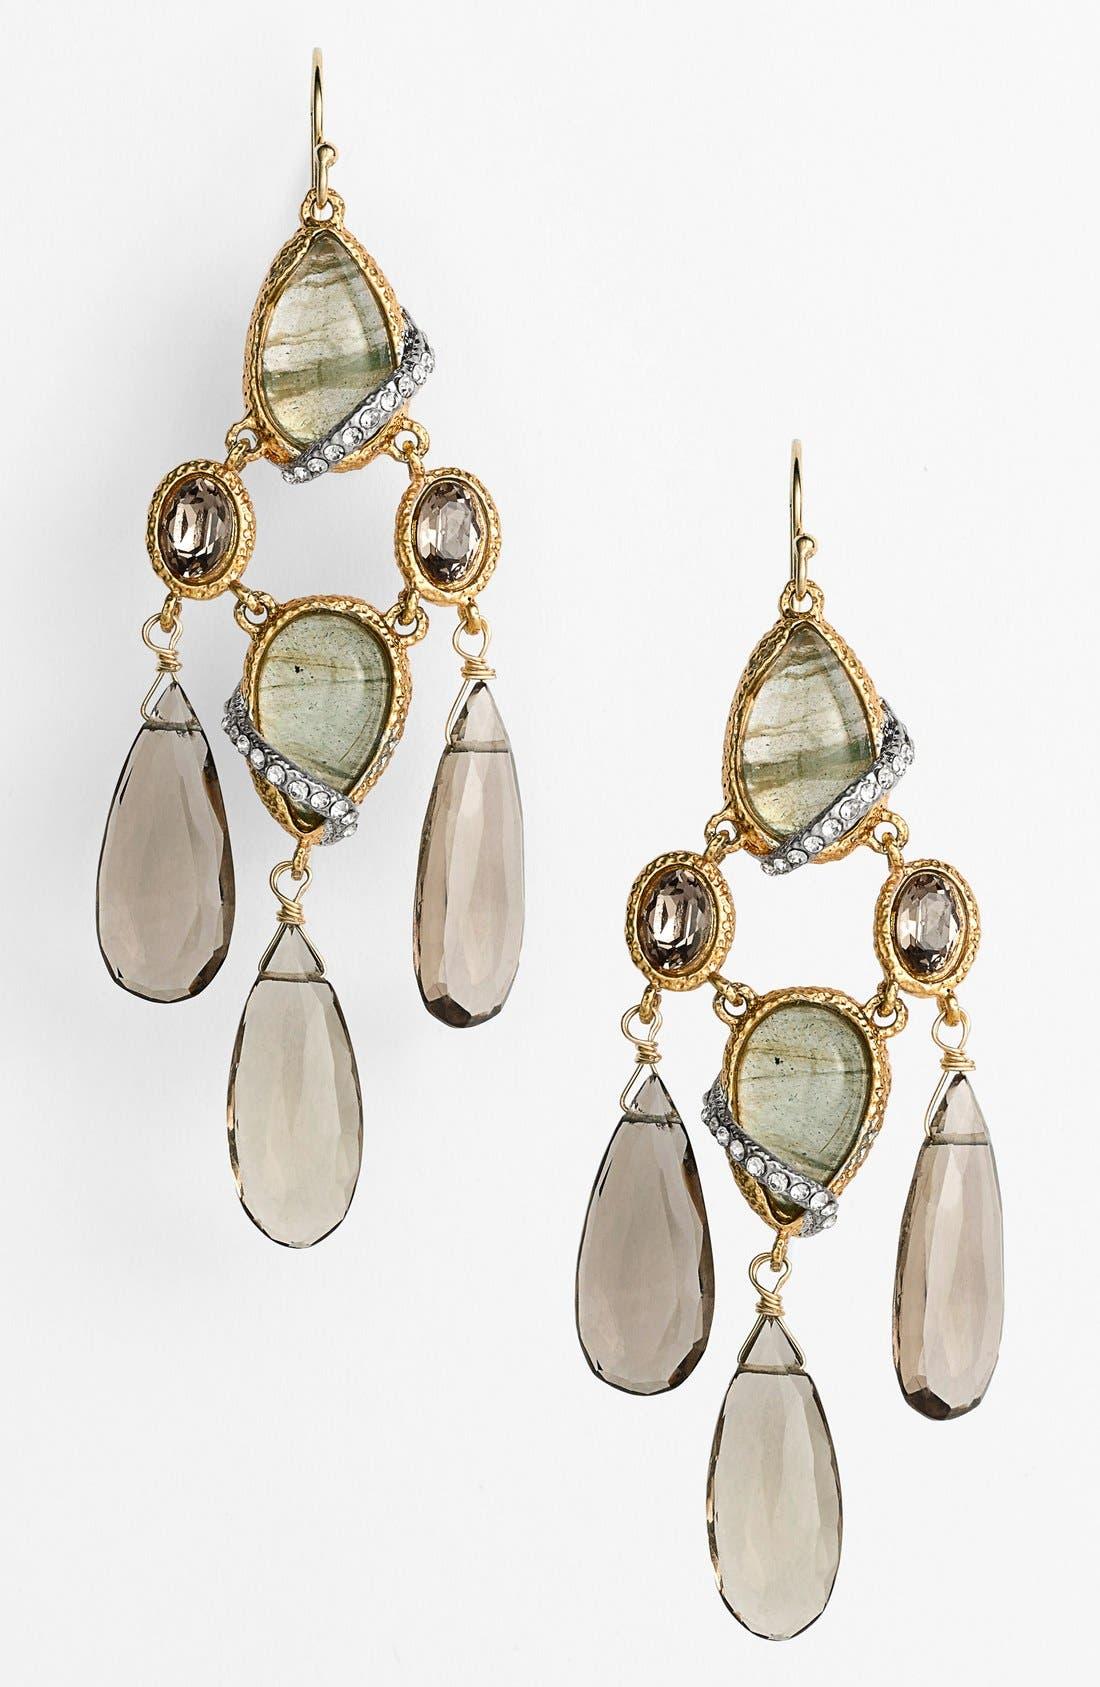 Alternate Image 1 Selected - Alexis Bittar 'Elements' Chandelier Earrings (Nordstrom Exclusive)